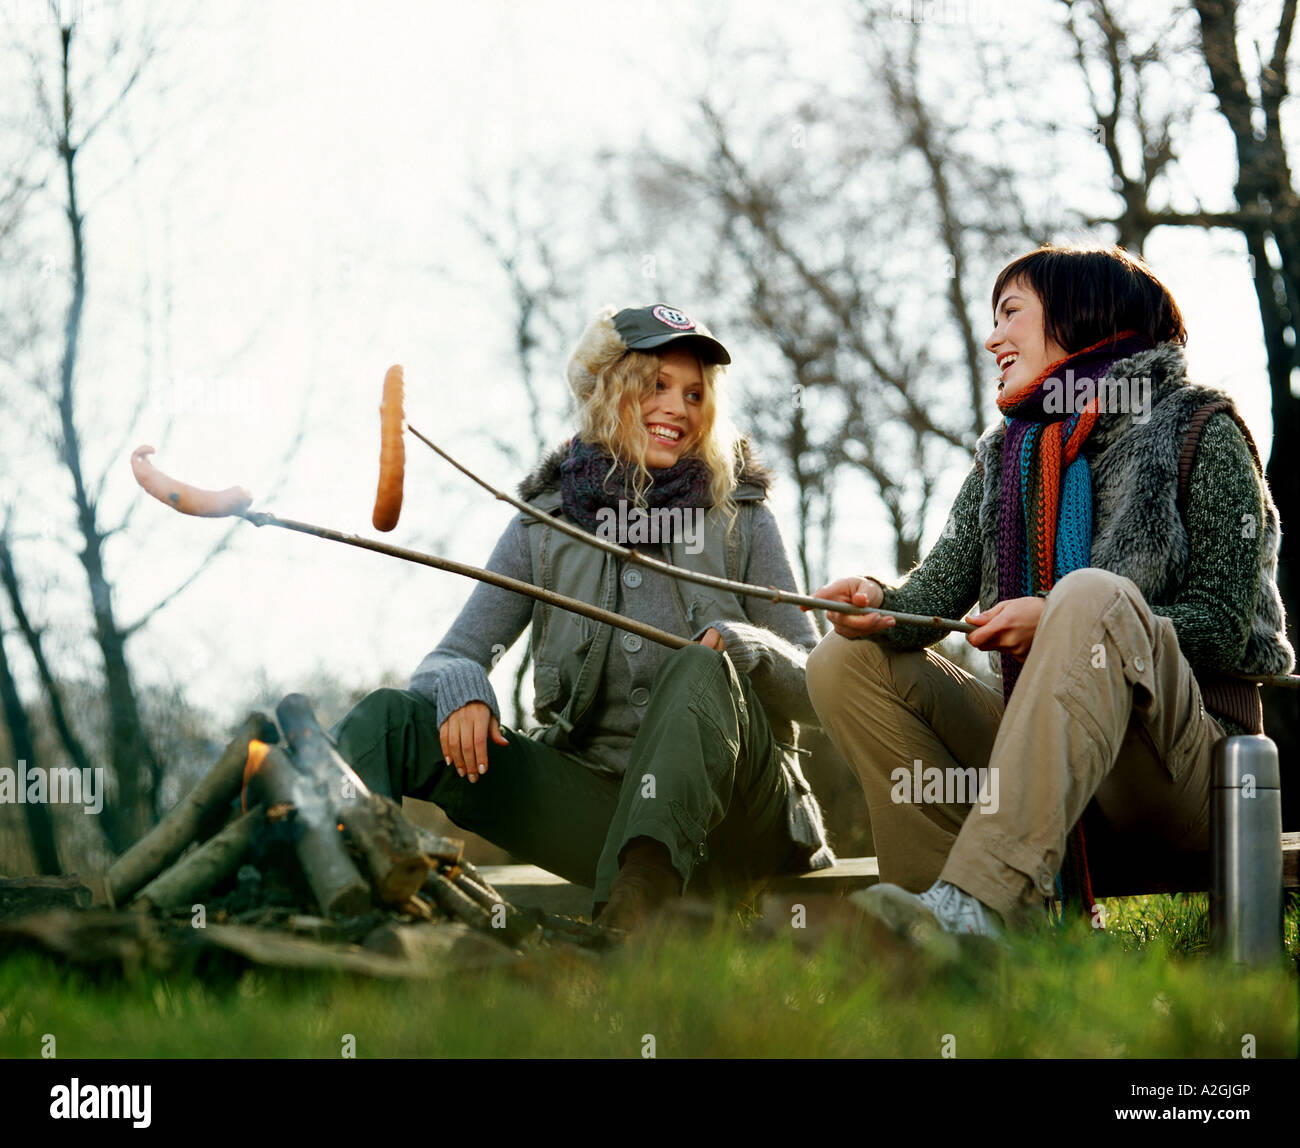 1212925 outdoor day autumn friend friends friendship woman women young 25 30 blonde brunette long hair forelock - Stock Image